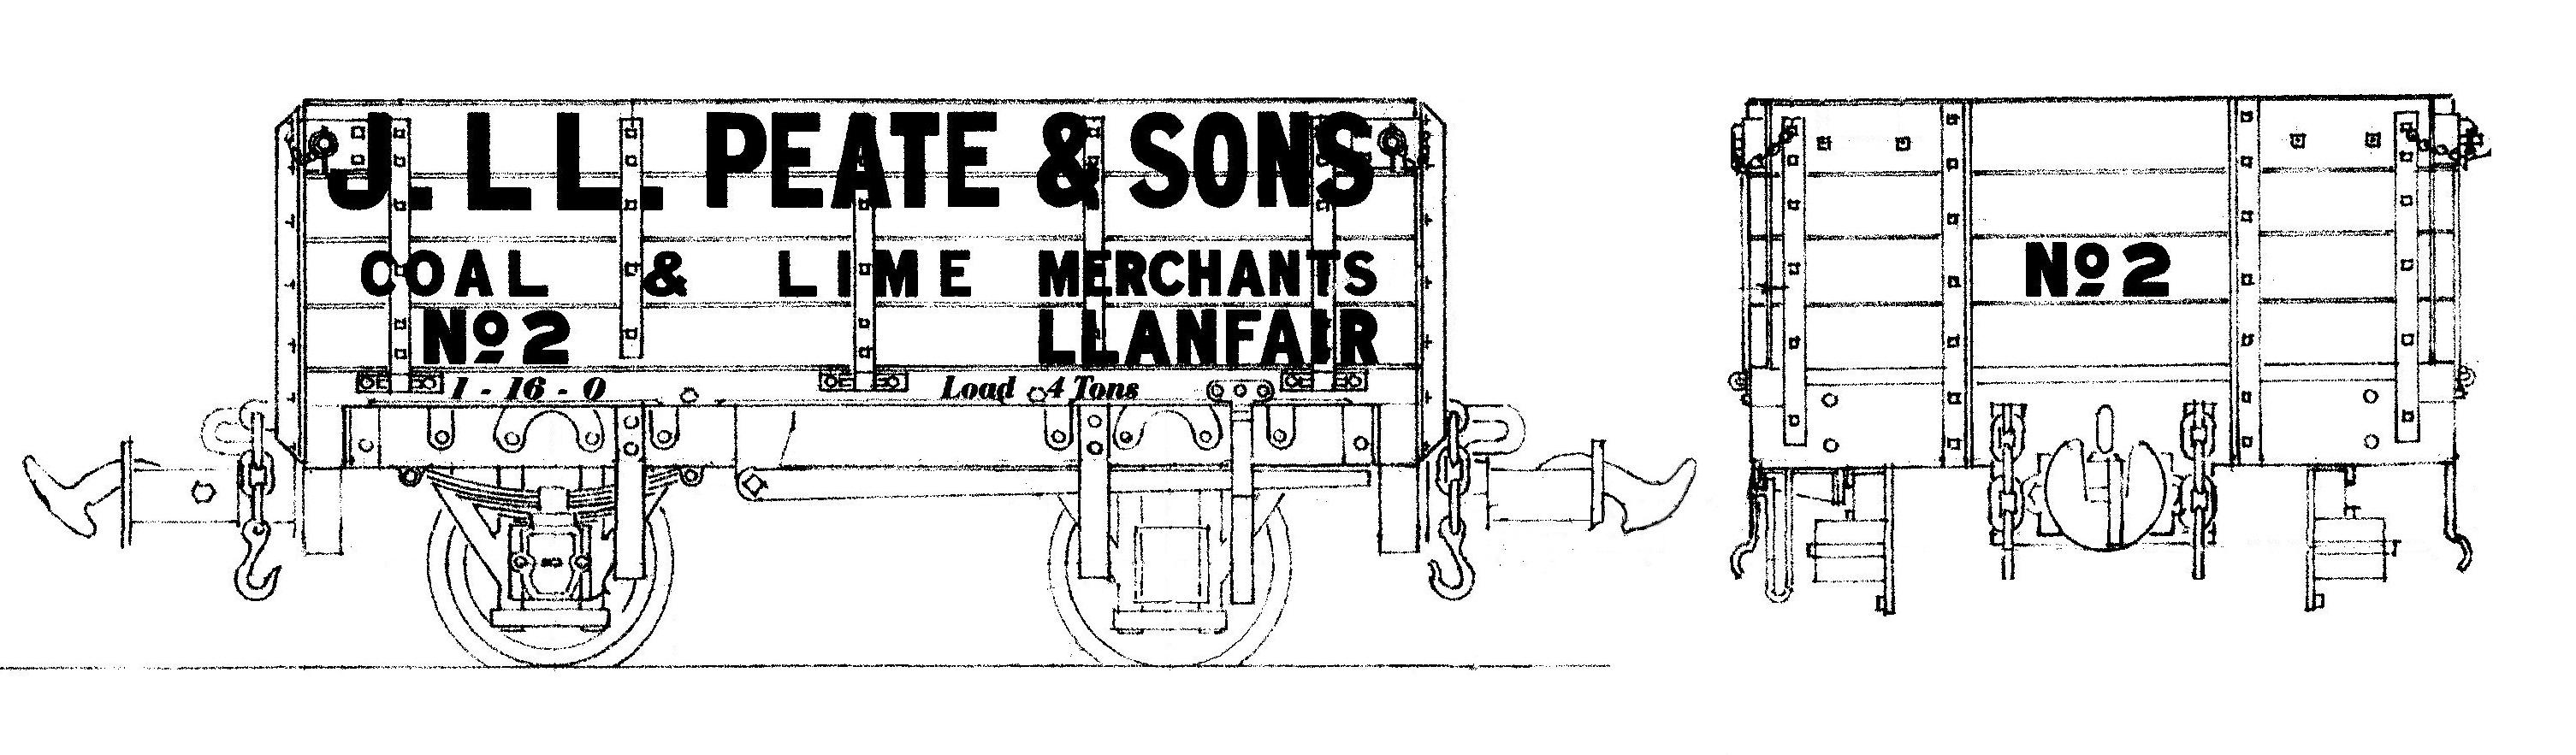 Welshpool & Llanfair open wagons - The Home Machinist!